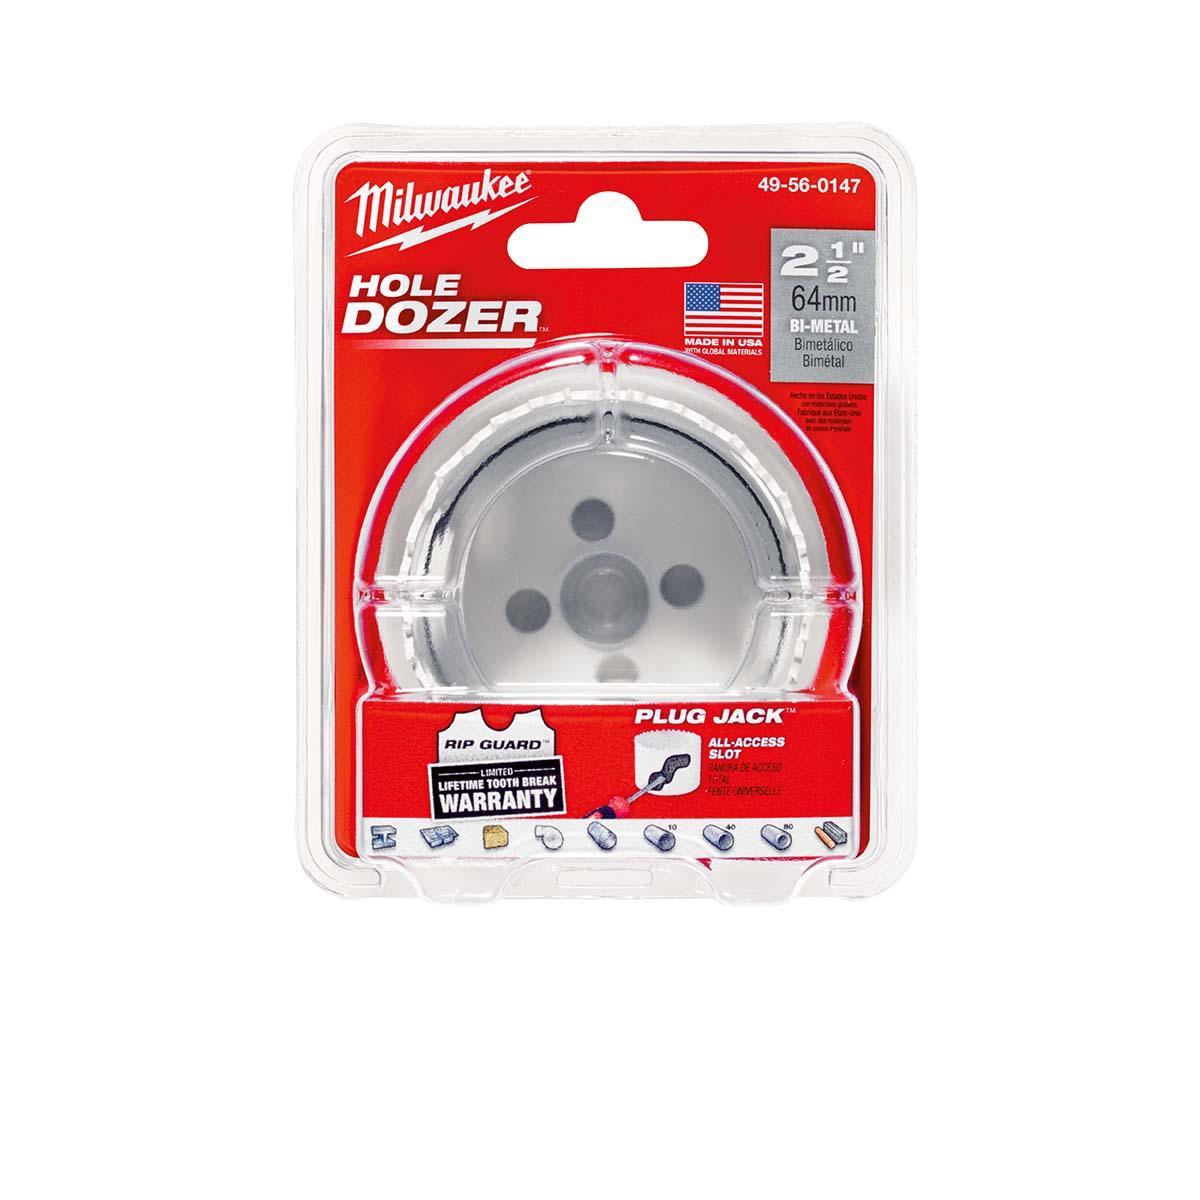 "2-1/2"" Hole Dozer Bi-Metal Hole Saw"